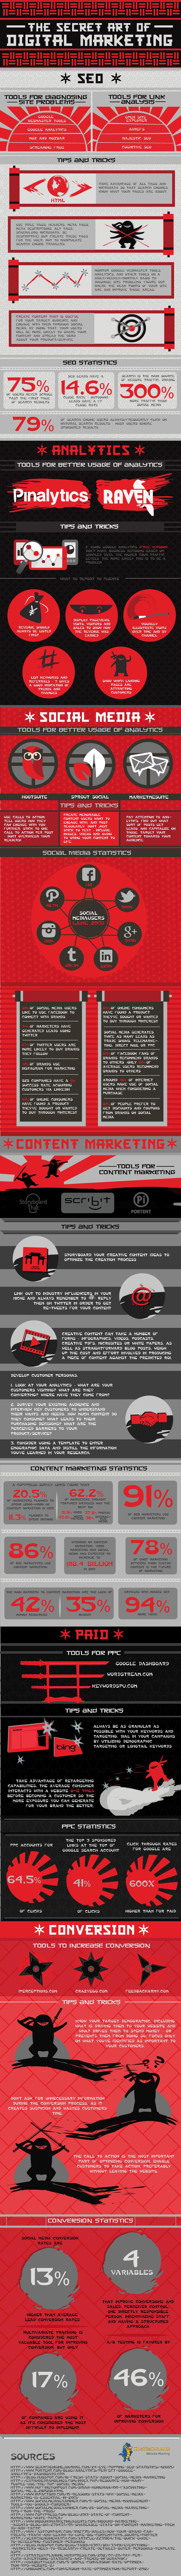 The Secret Art of Digital Marketing1]